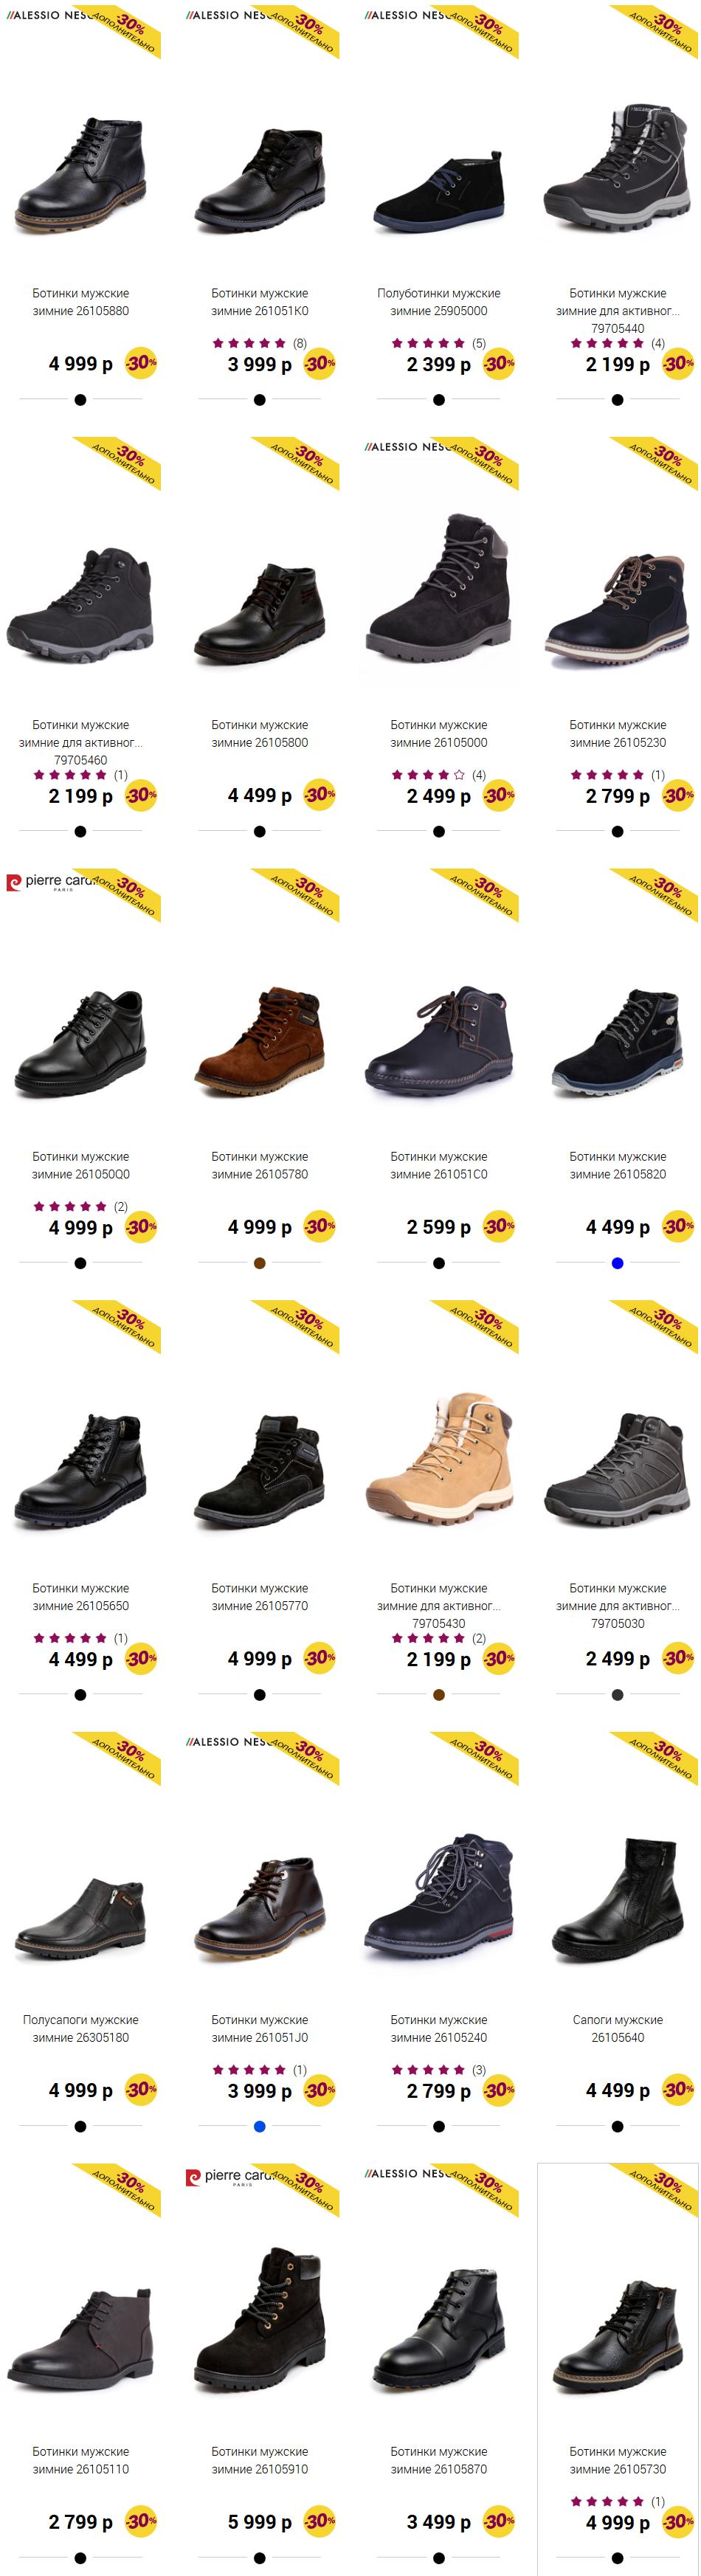 Мужская обувь интернет магазина Кари